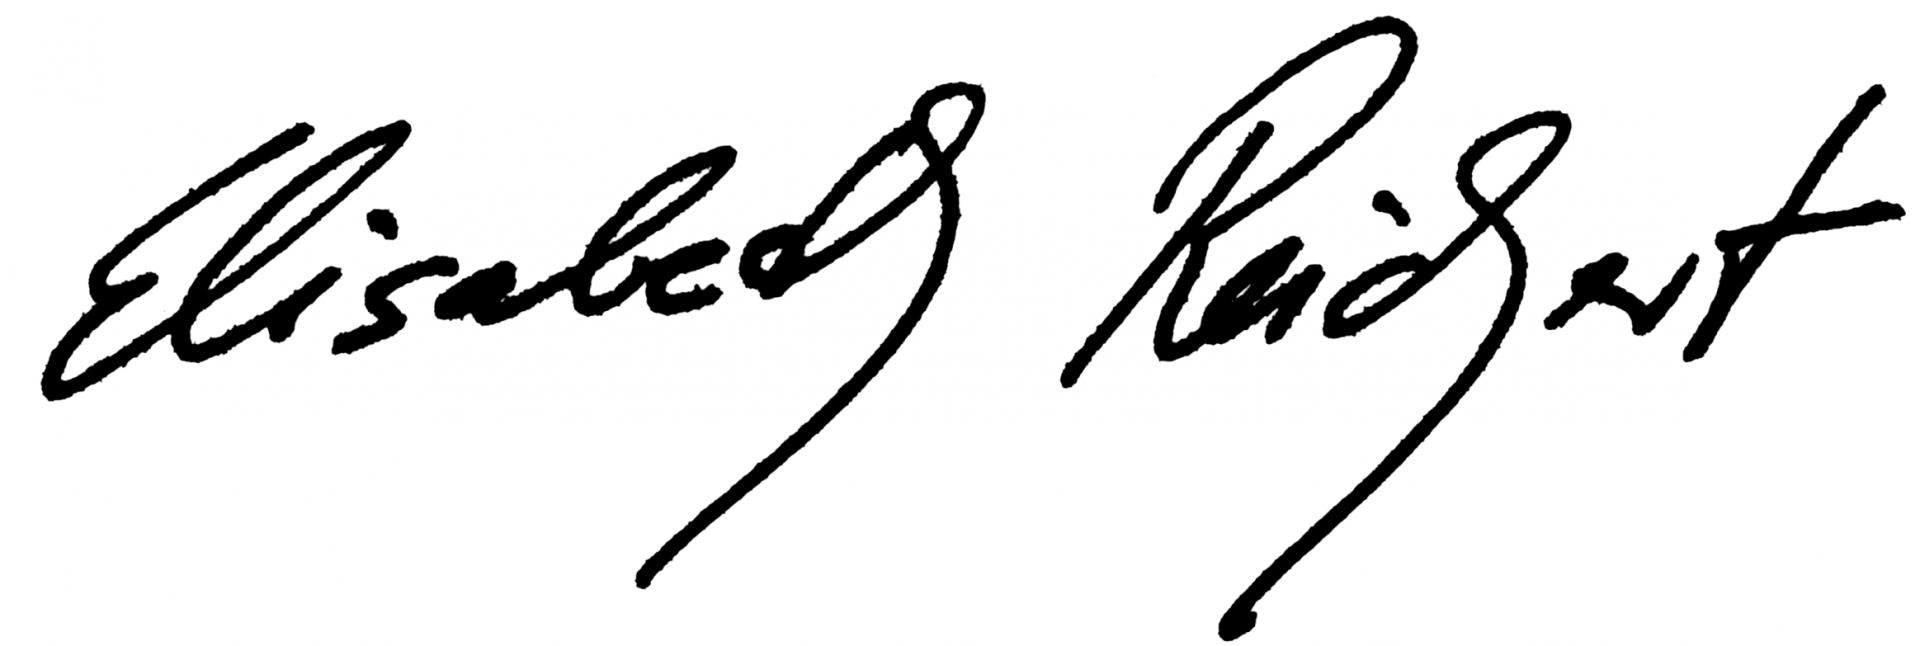 Unterschrift Frau Reichert